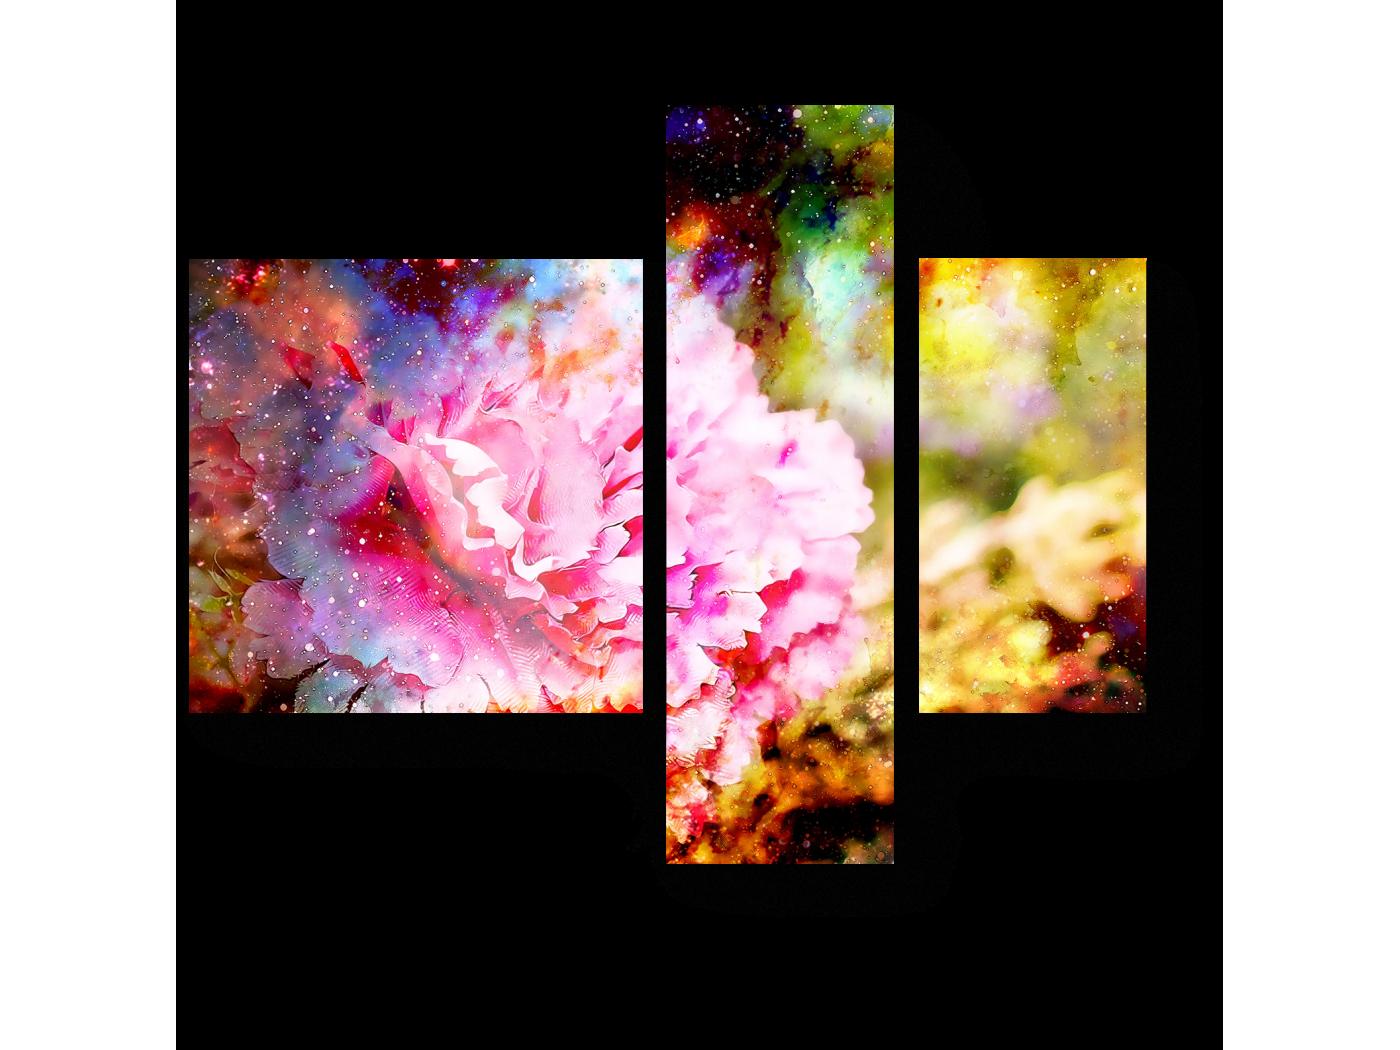 Модульная картина Гвоздика (80x66) фото